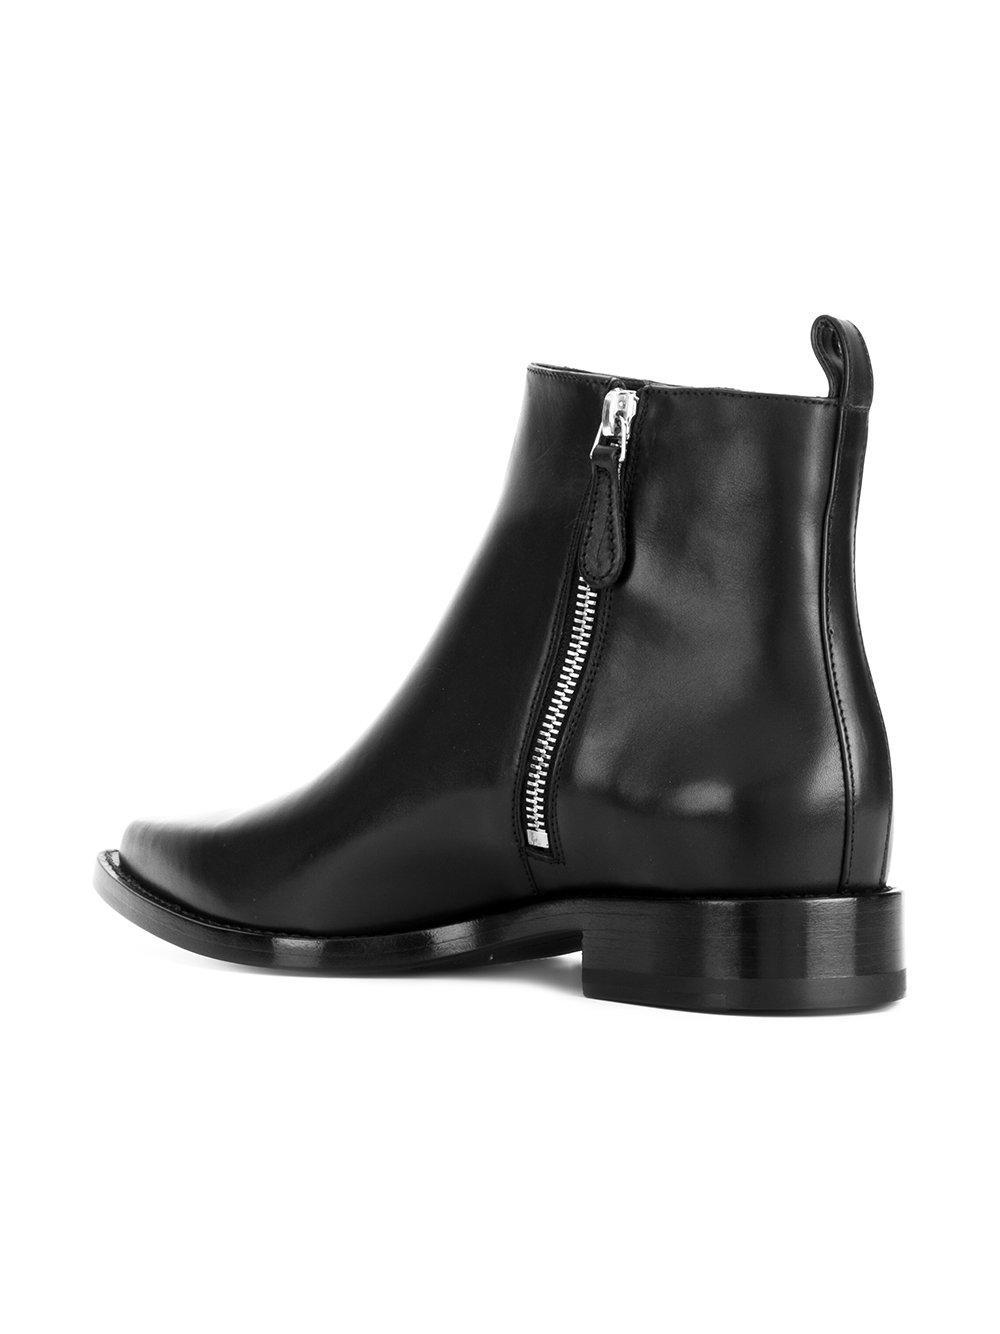 chain and eyelet detail Chelsea boots - Black Alexander McQueen Nicekicks Cheap Price JaG2u